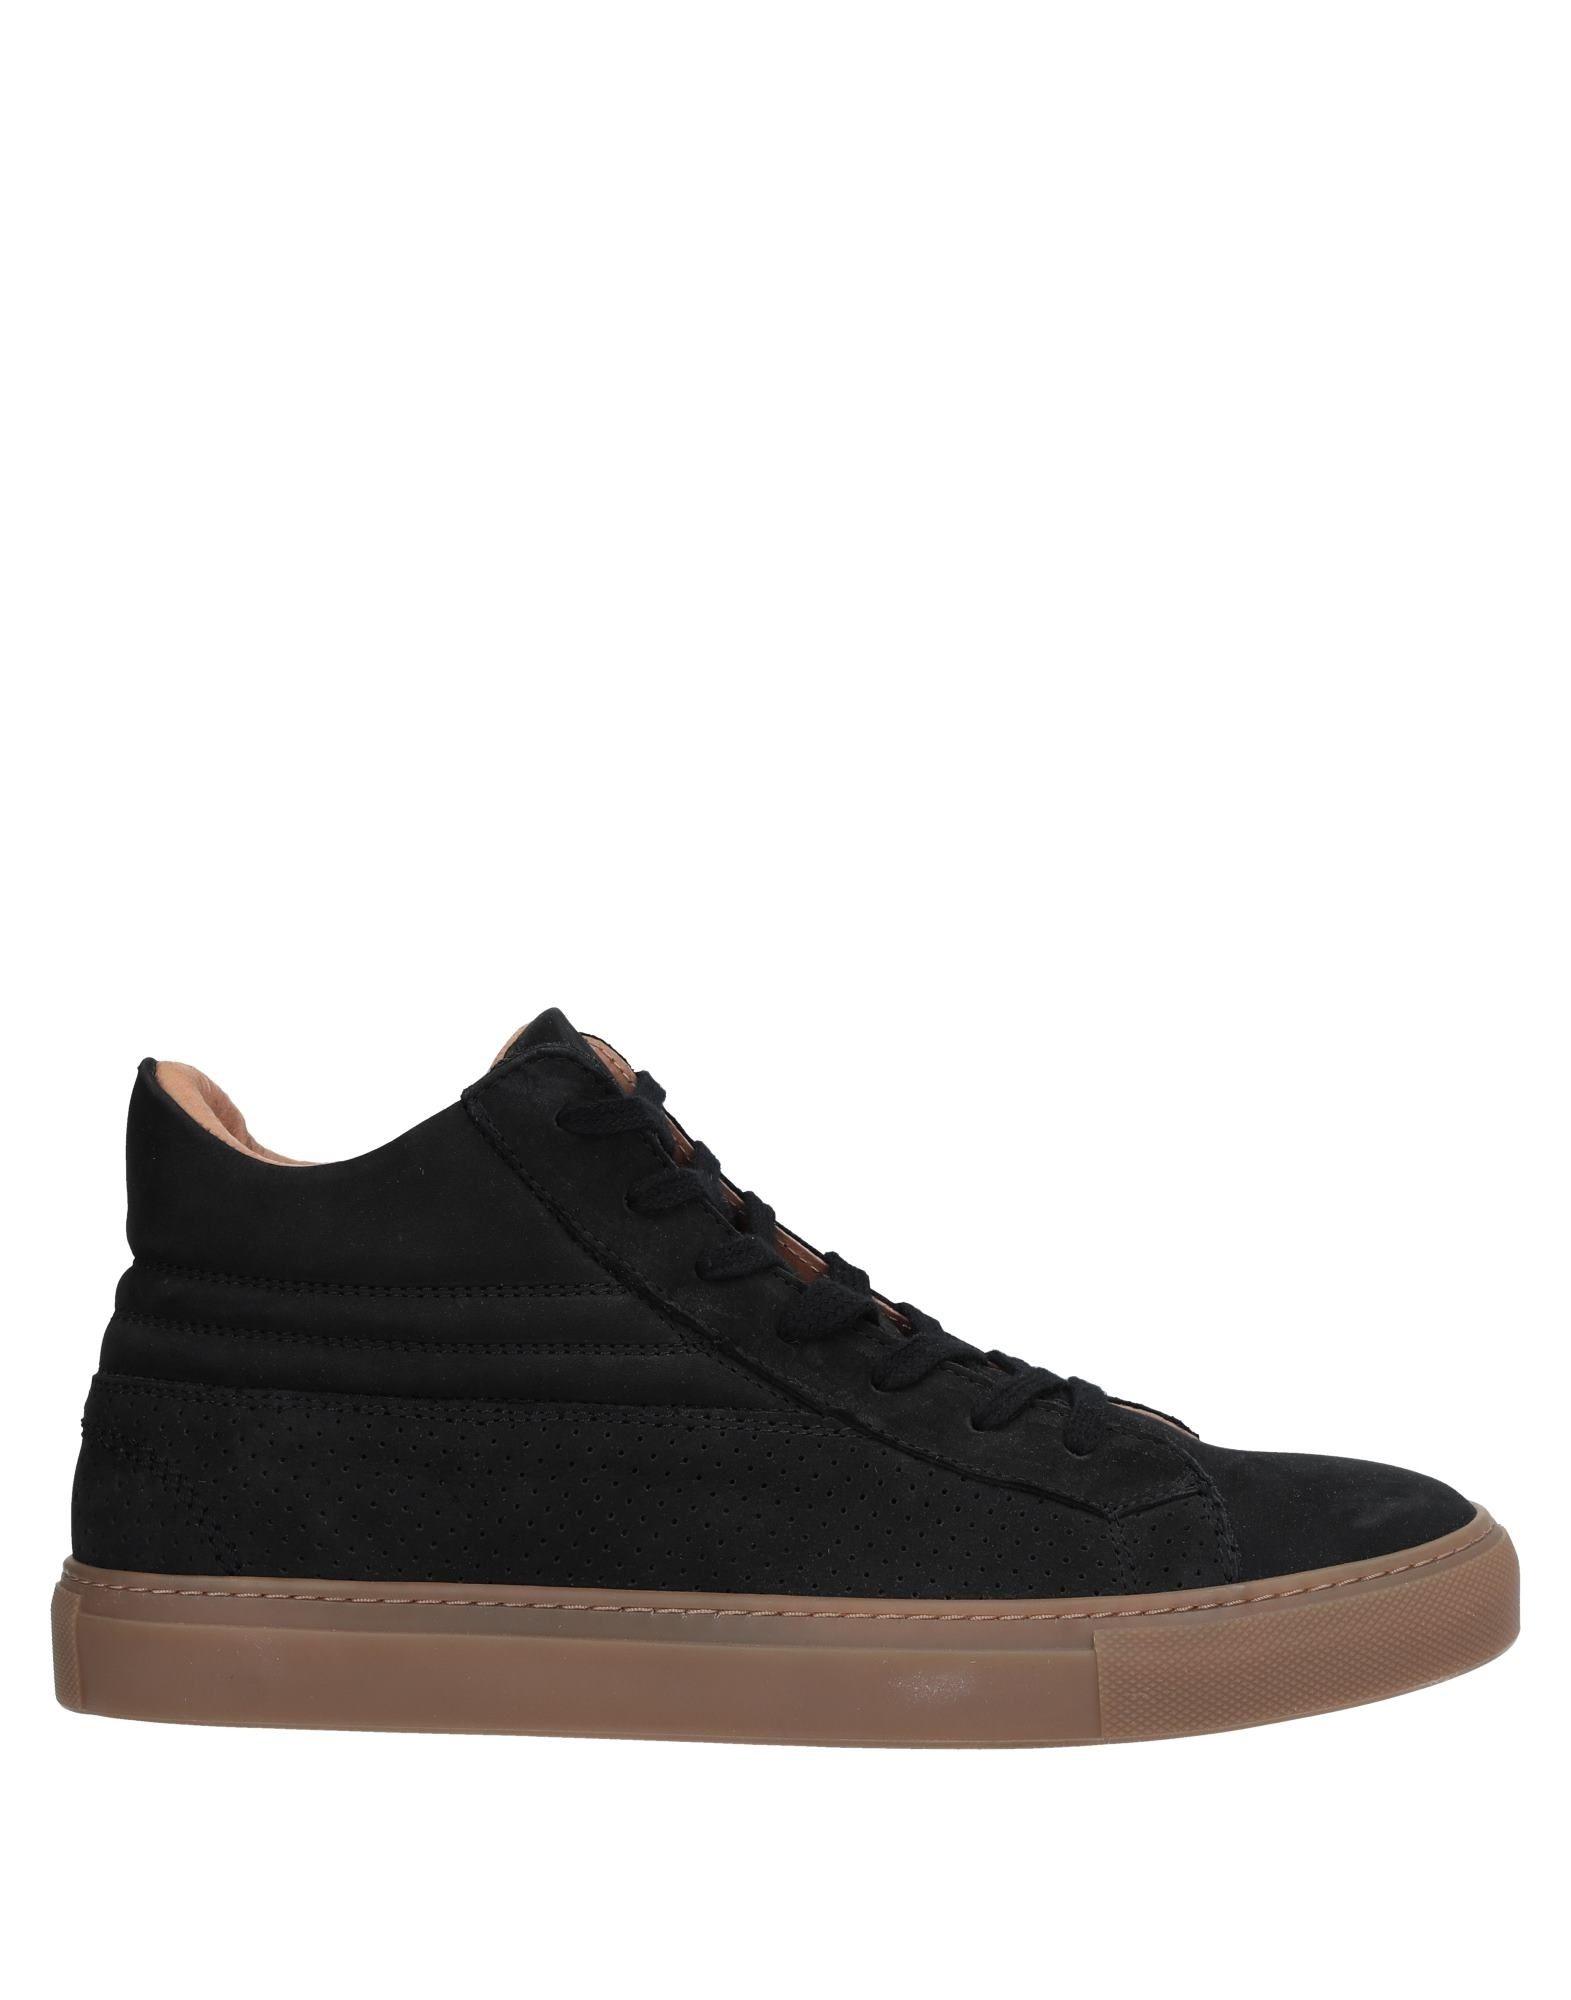 Sneakers Selected Homme Uomo - 11537175XA